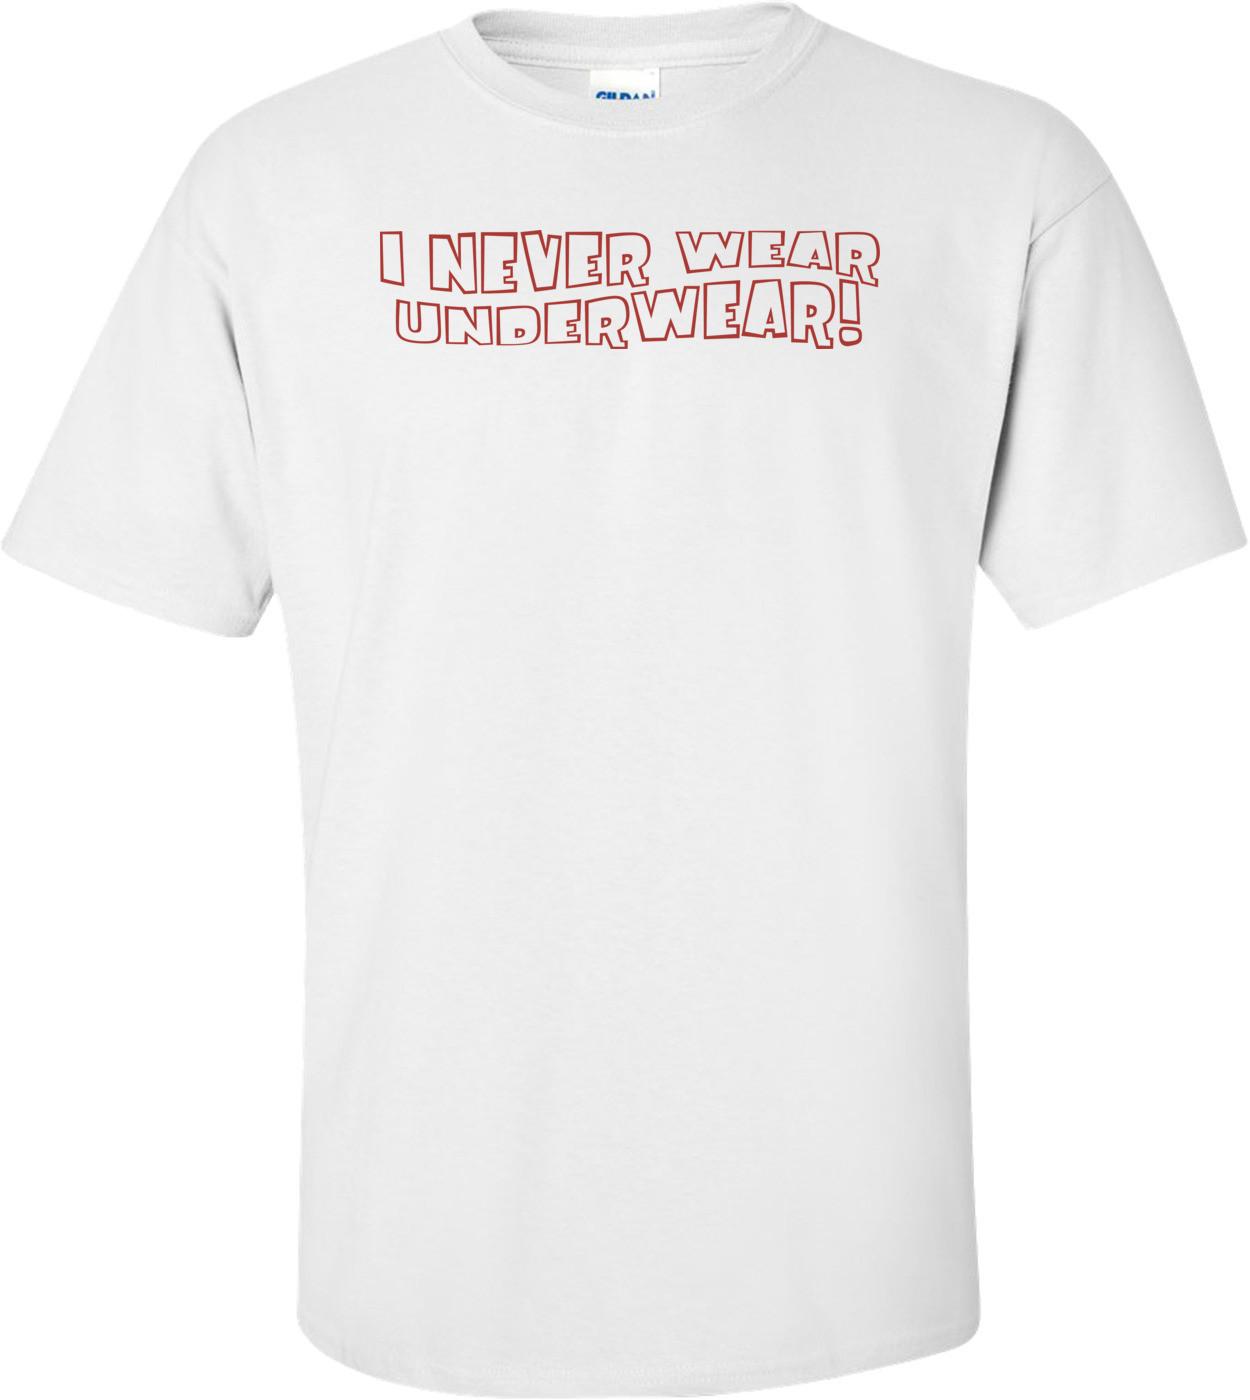 I Never Wear Underwear T-shirt